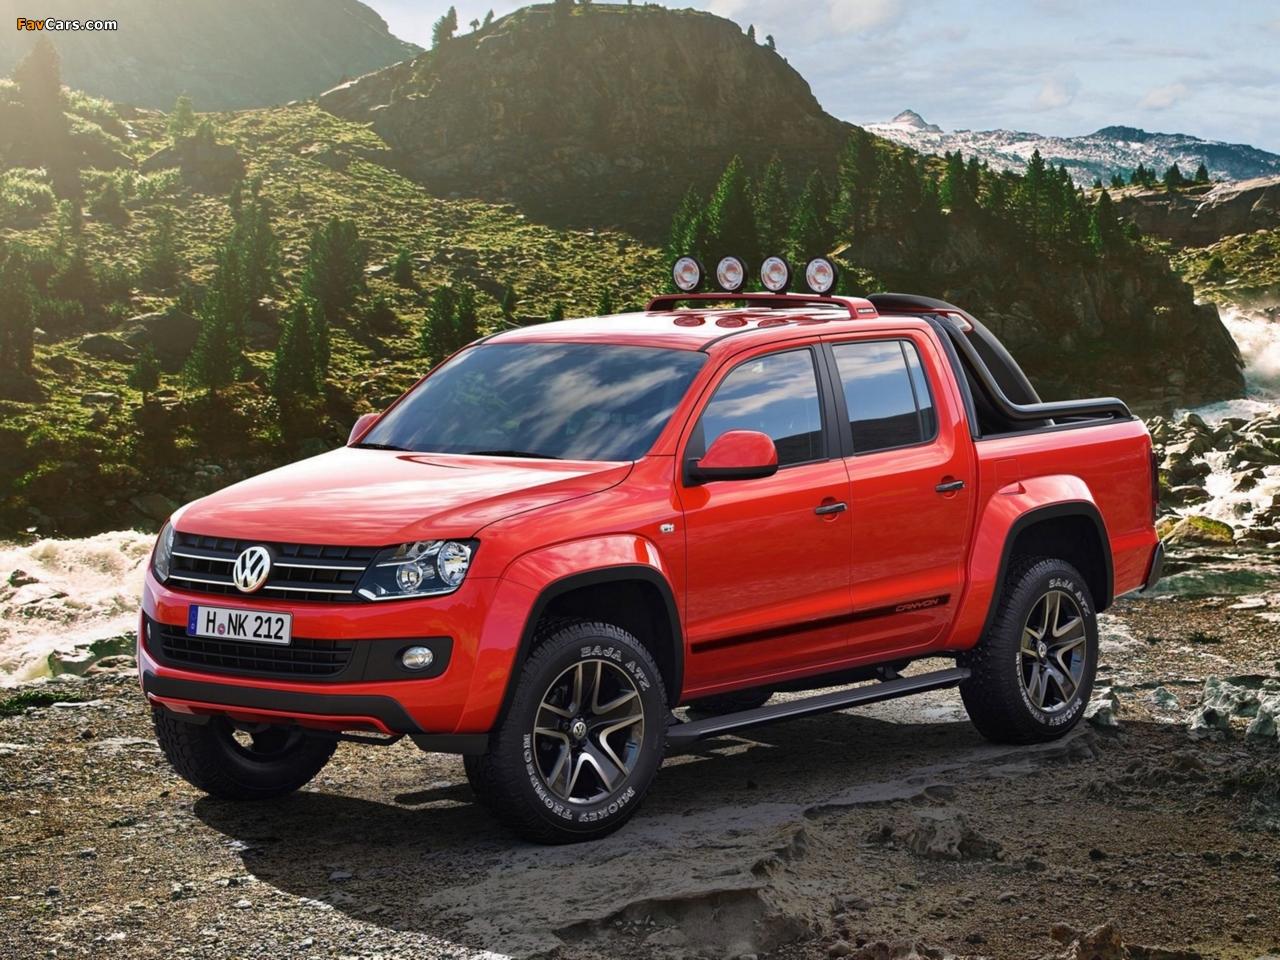 Volkswagen Amarok Canyon Concept 2012 pictures (1280 x 960)